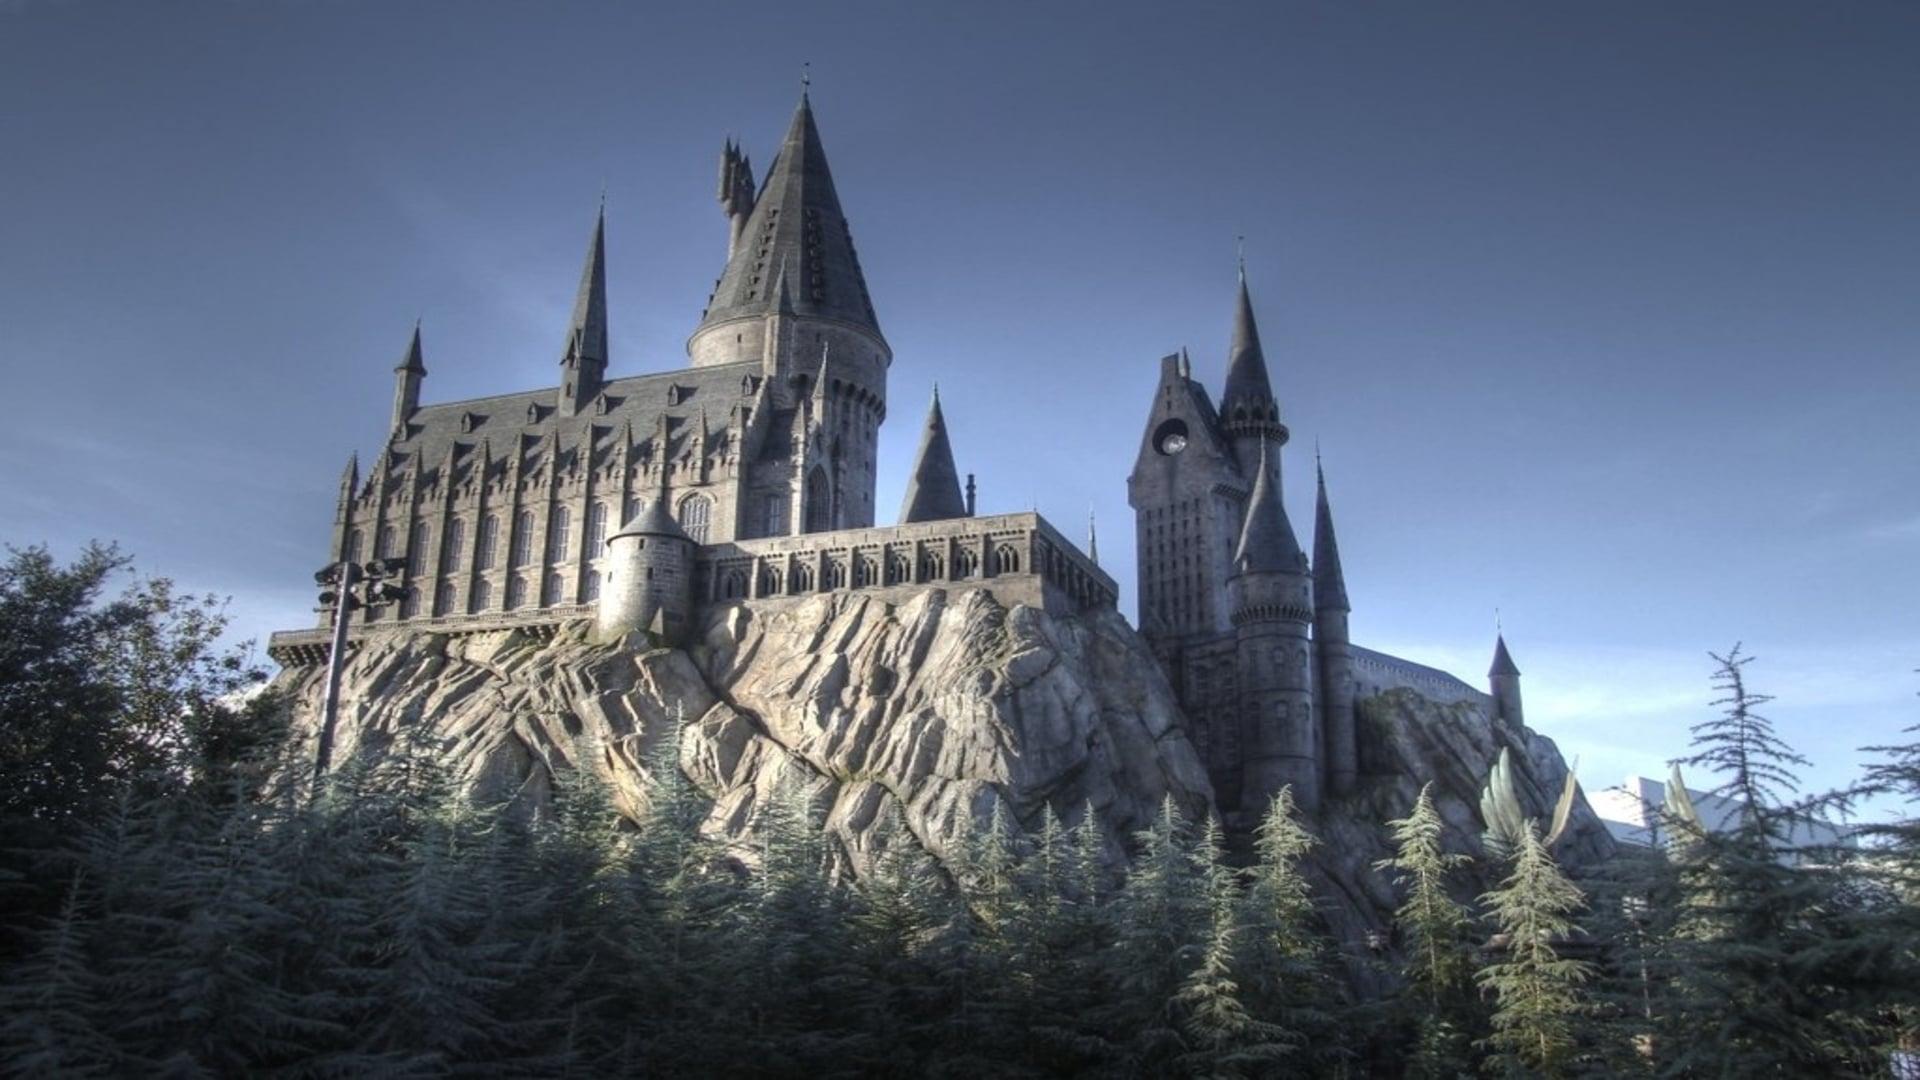 Hogwarts school - A symbol of danger